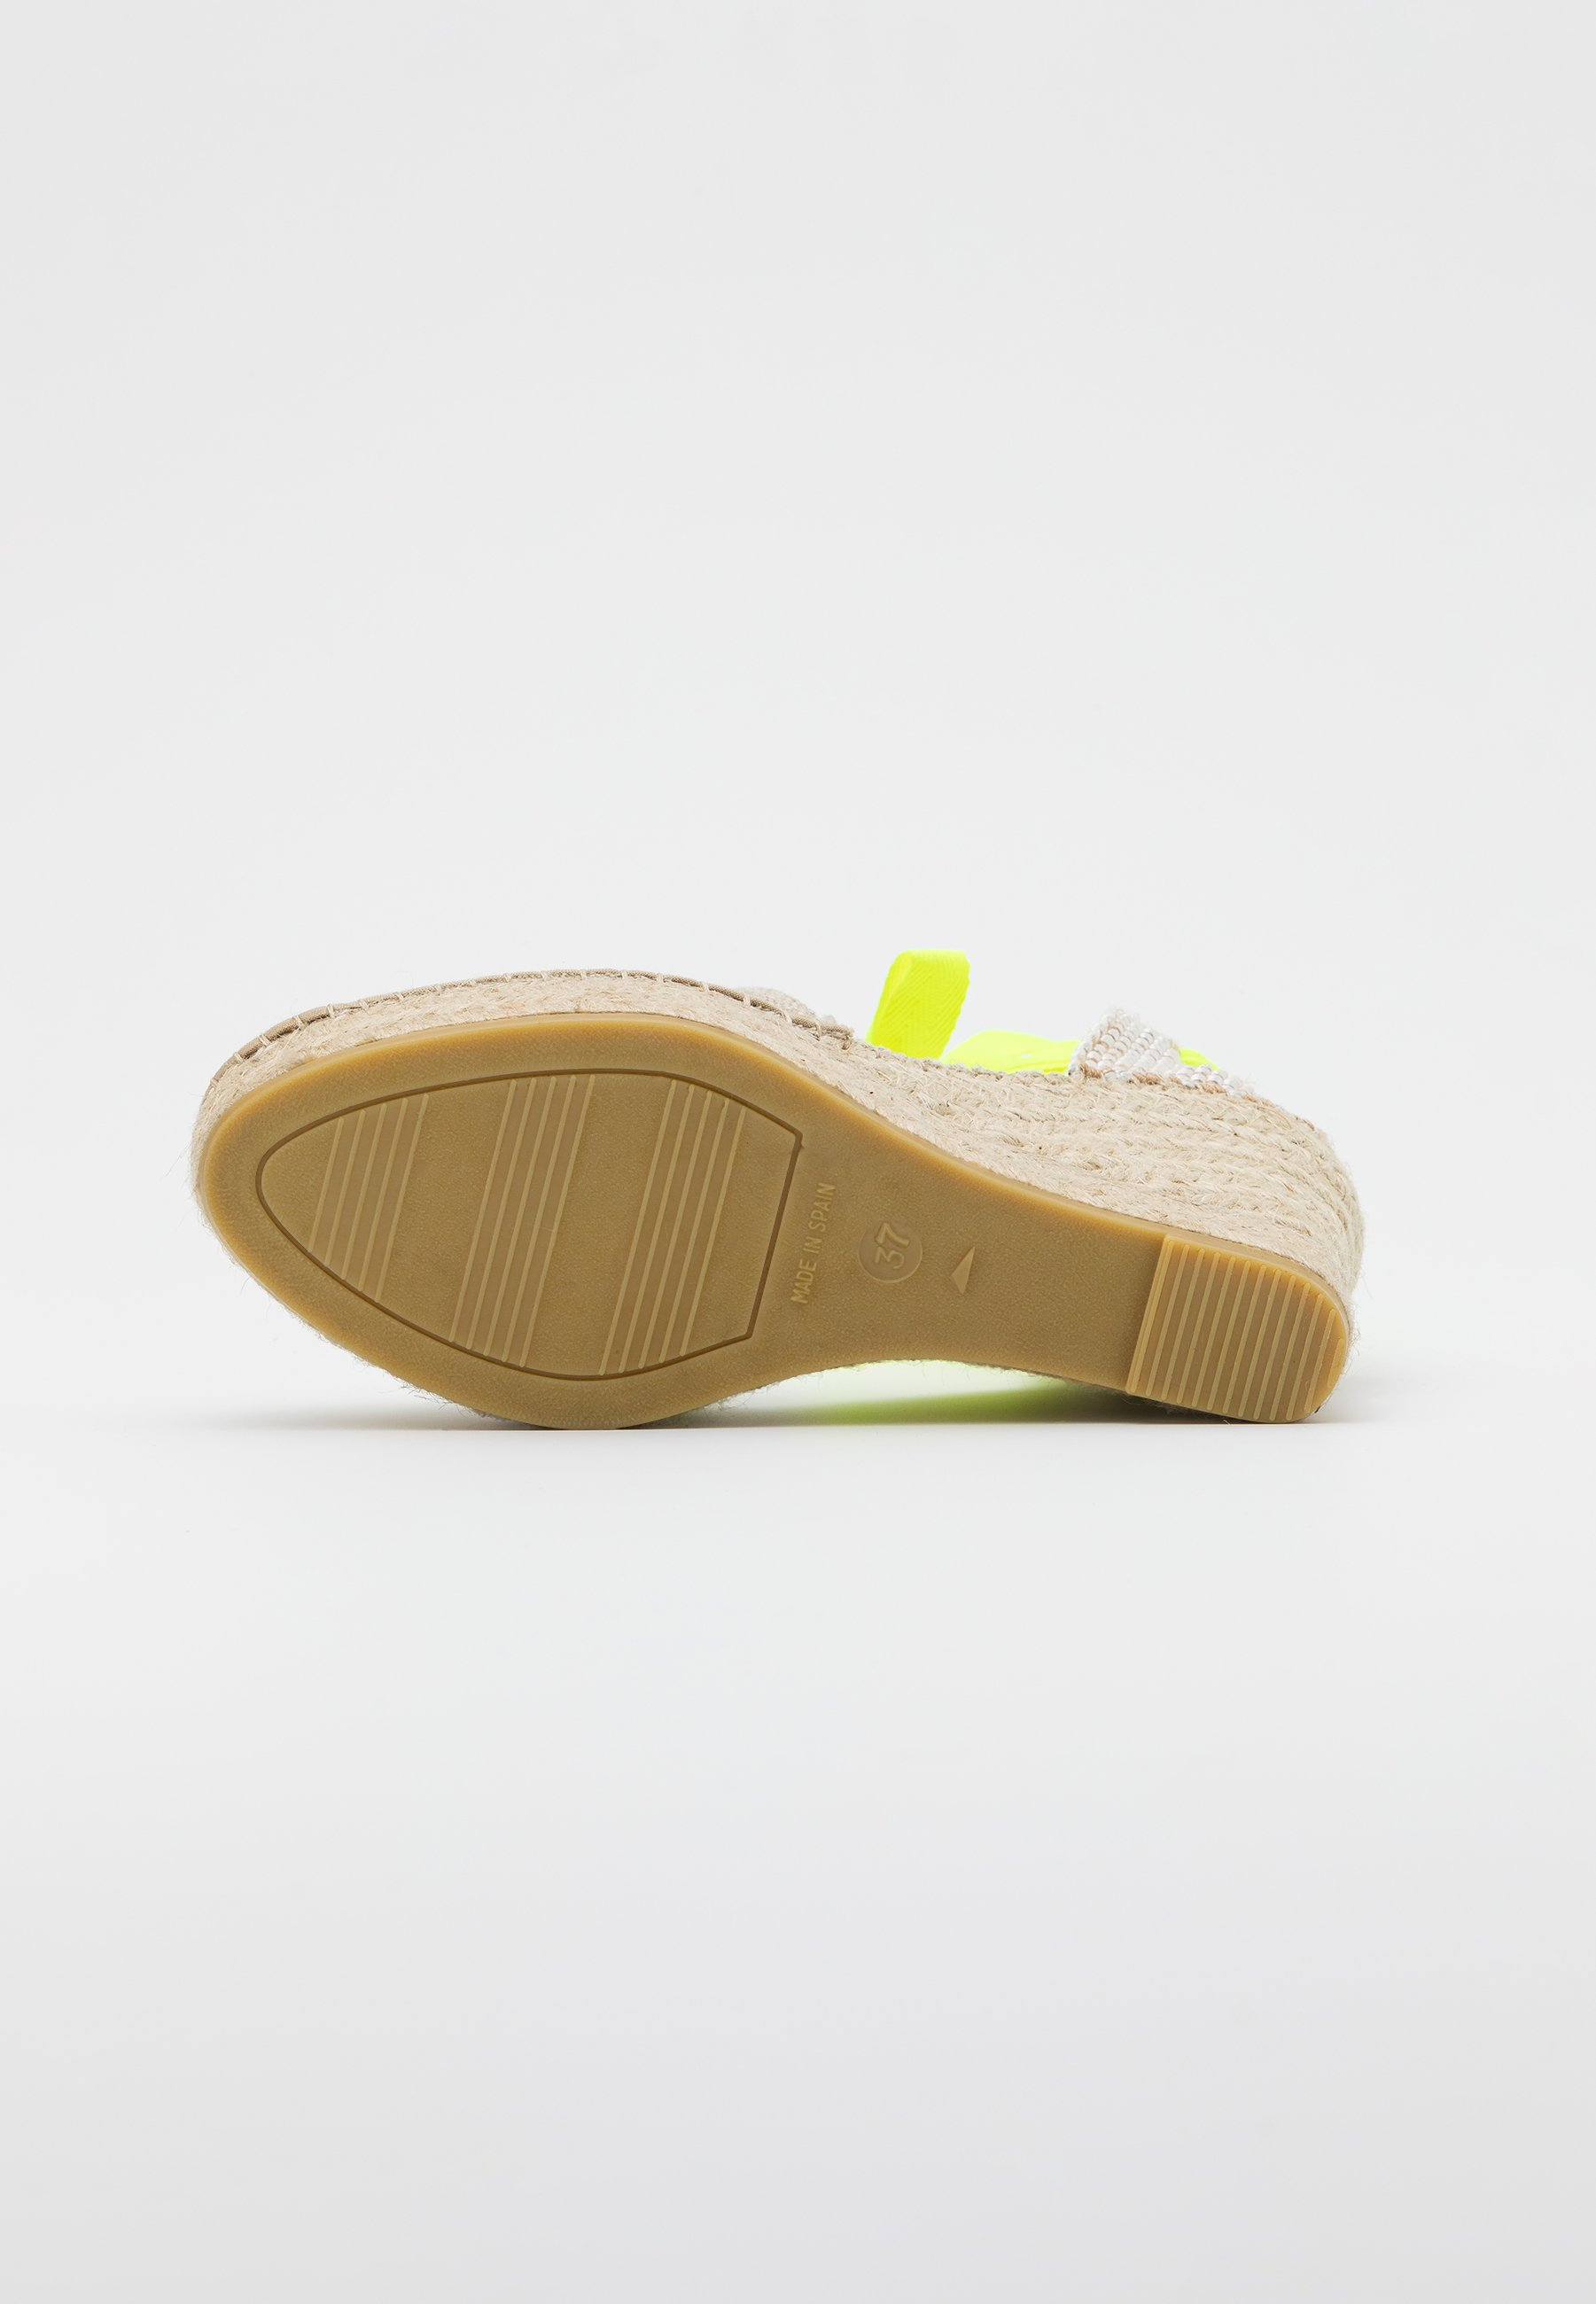 Sandaletter lino piedramensaje amaril